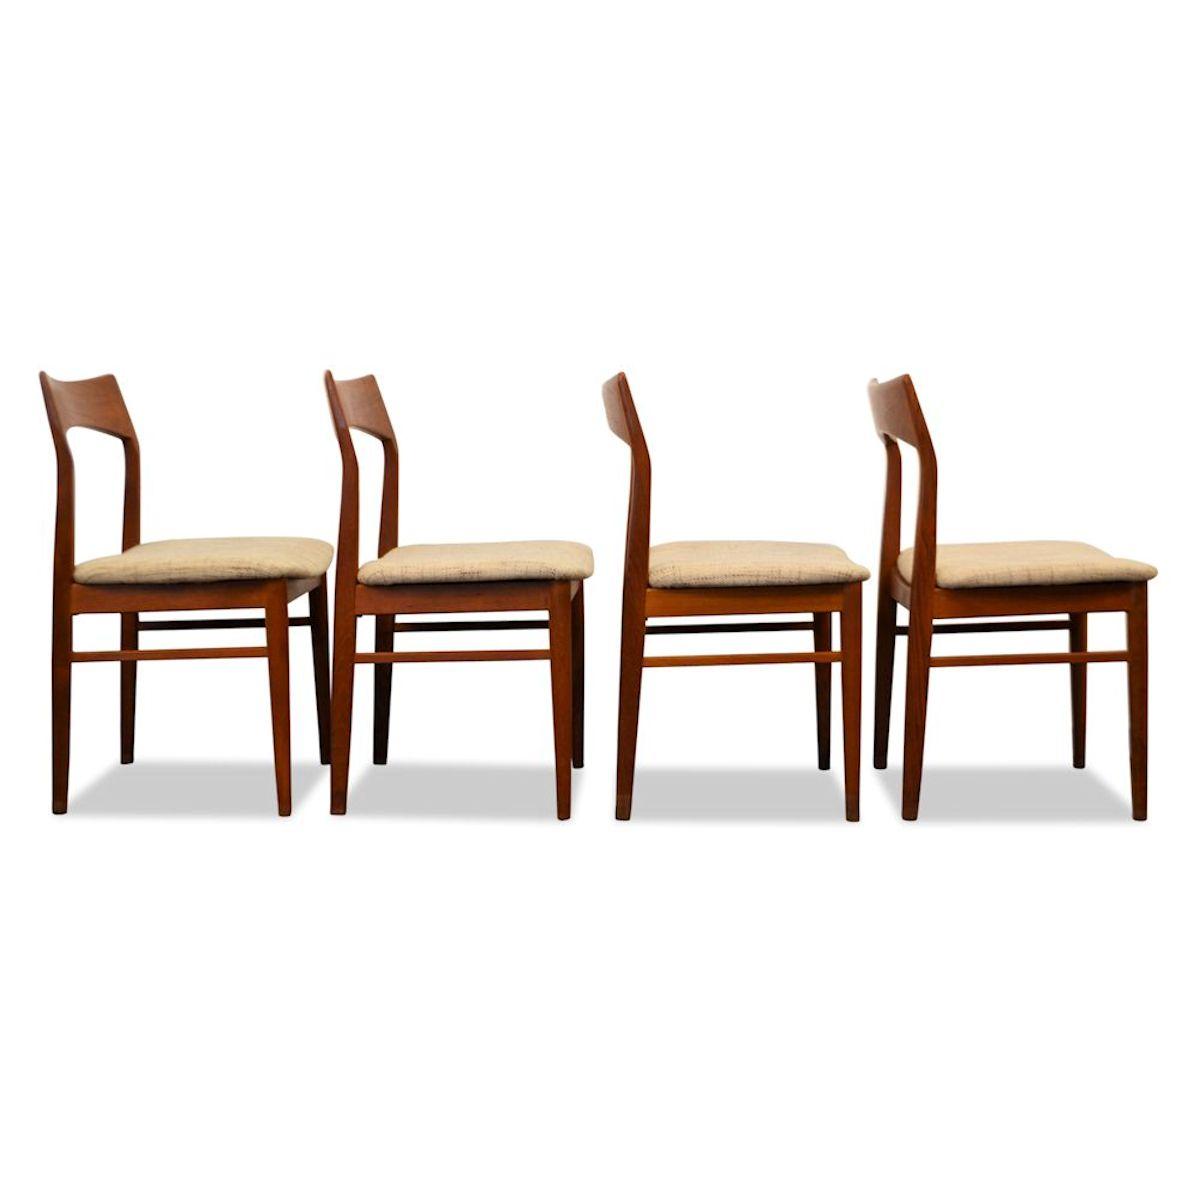 Vintage henning kjaernulf teak stoelen 4 vintage vibes for Vintage stoelen